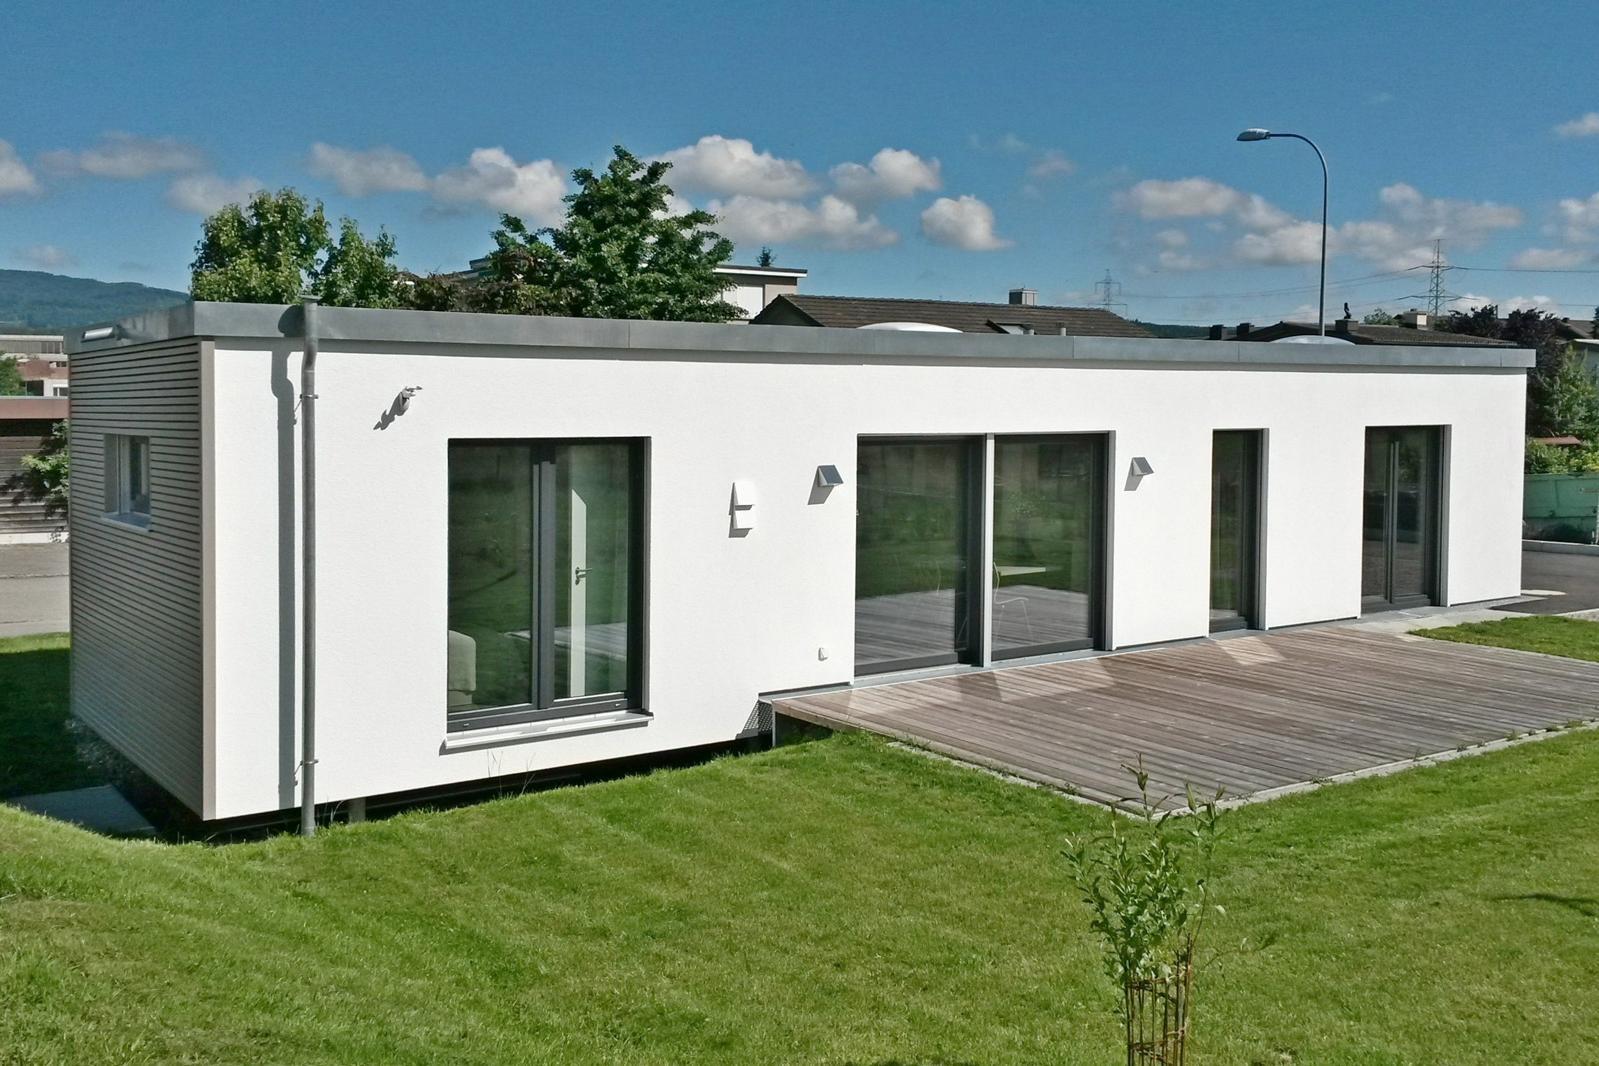 maisons t moins schw rer d niken suisse schw rerhaus. Black Bedroom Furniture Sets. Home Design Ideas